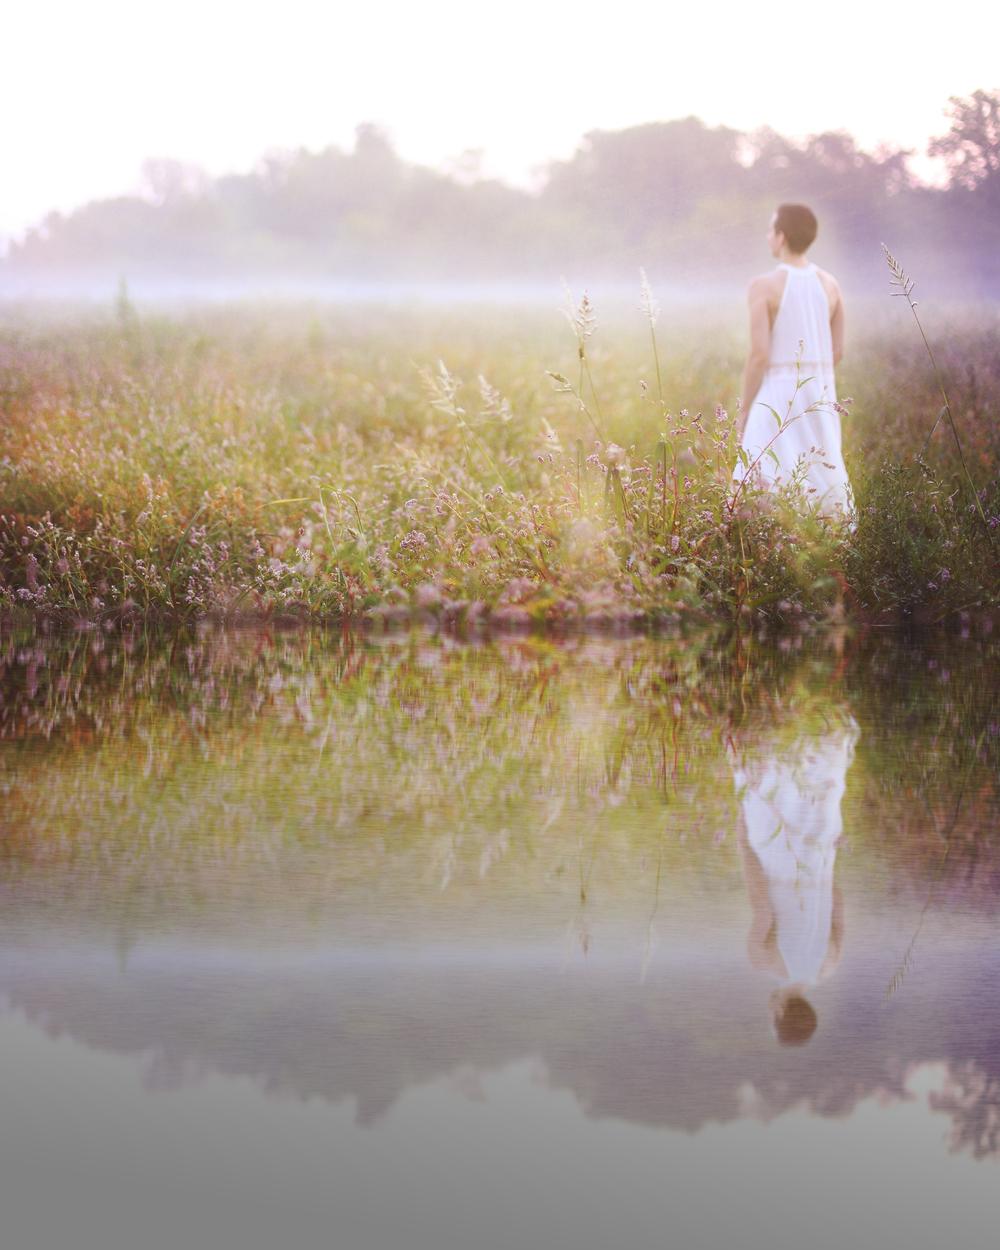 reflectionphotoshop.jpg